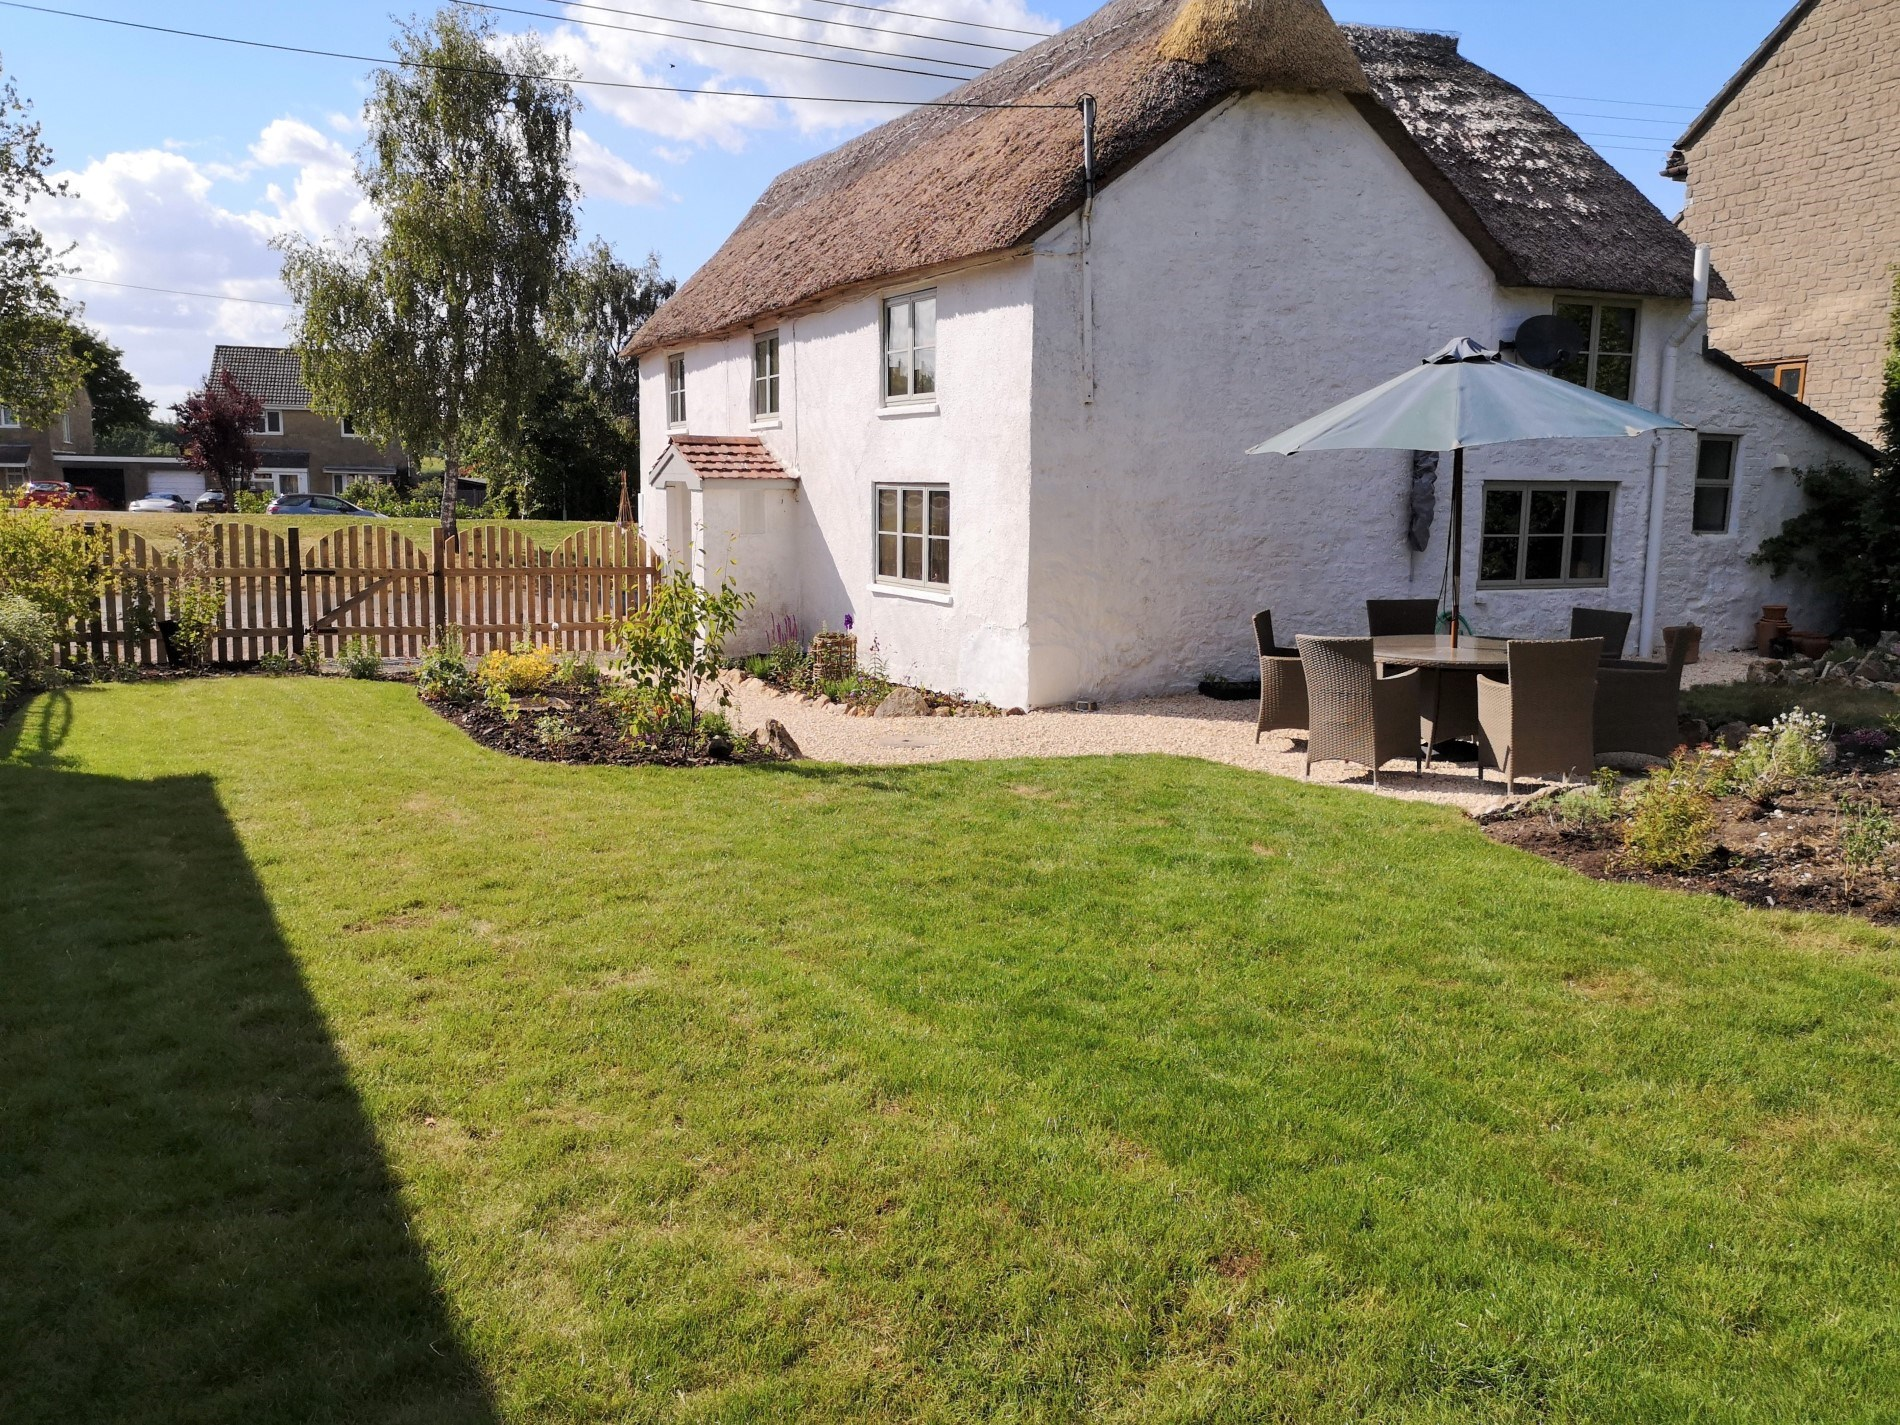 3 Bedroom Cottage in Beaminster, Dorset and Somerset